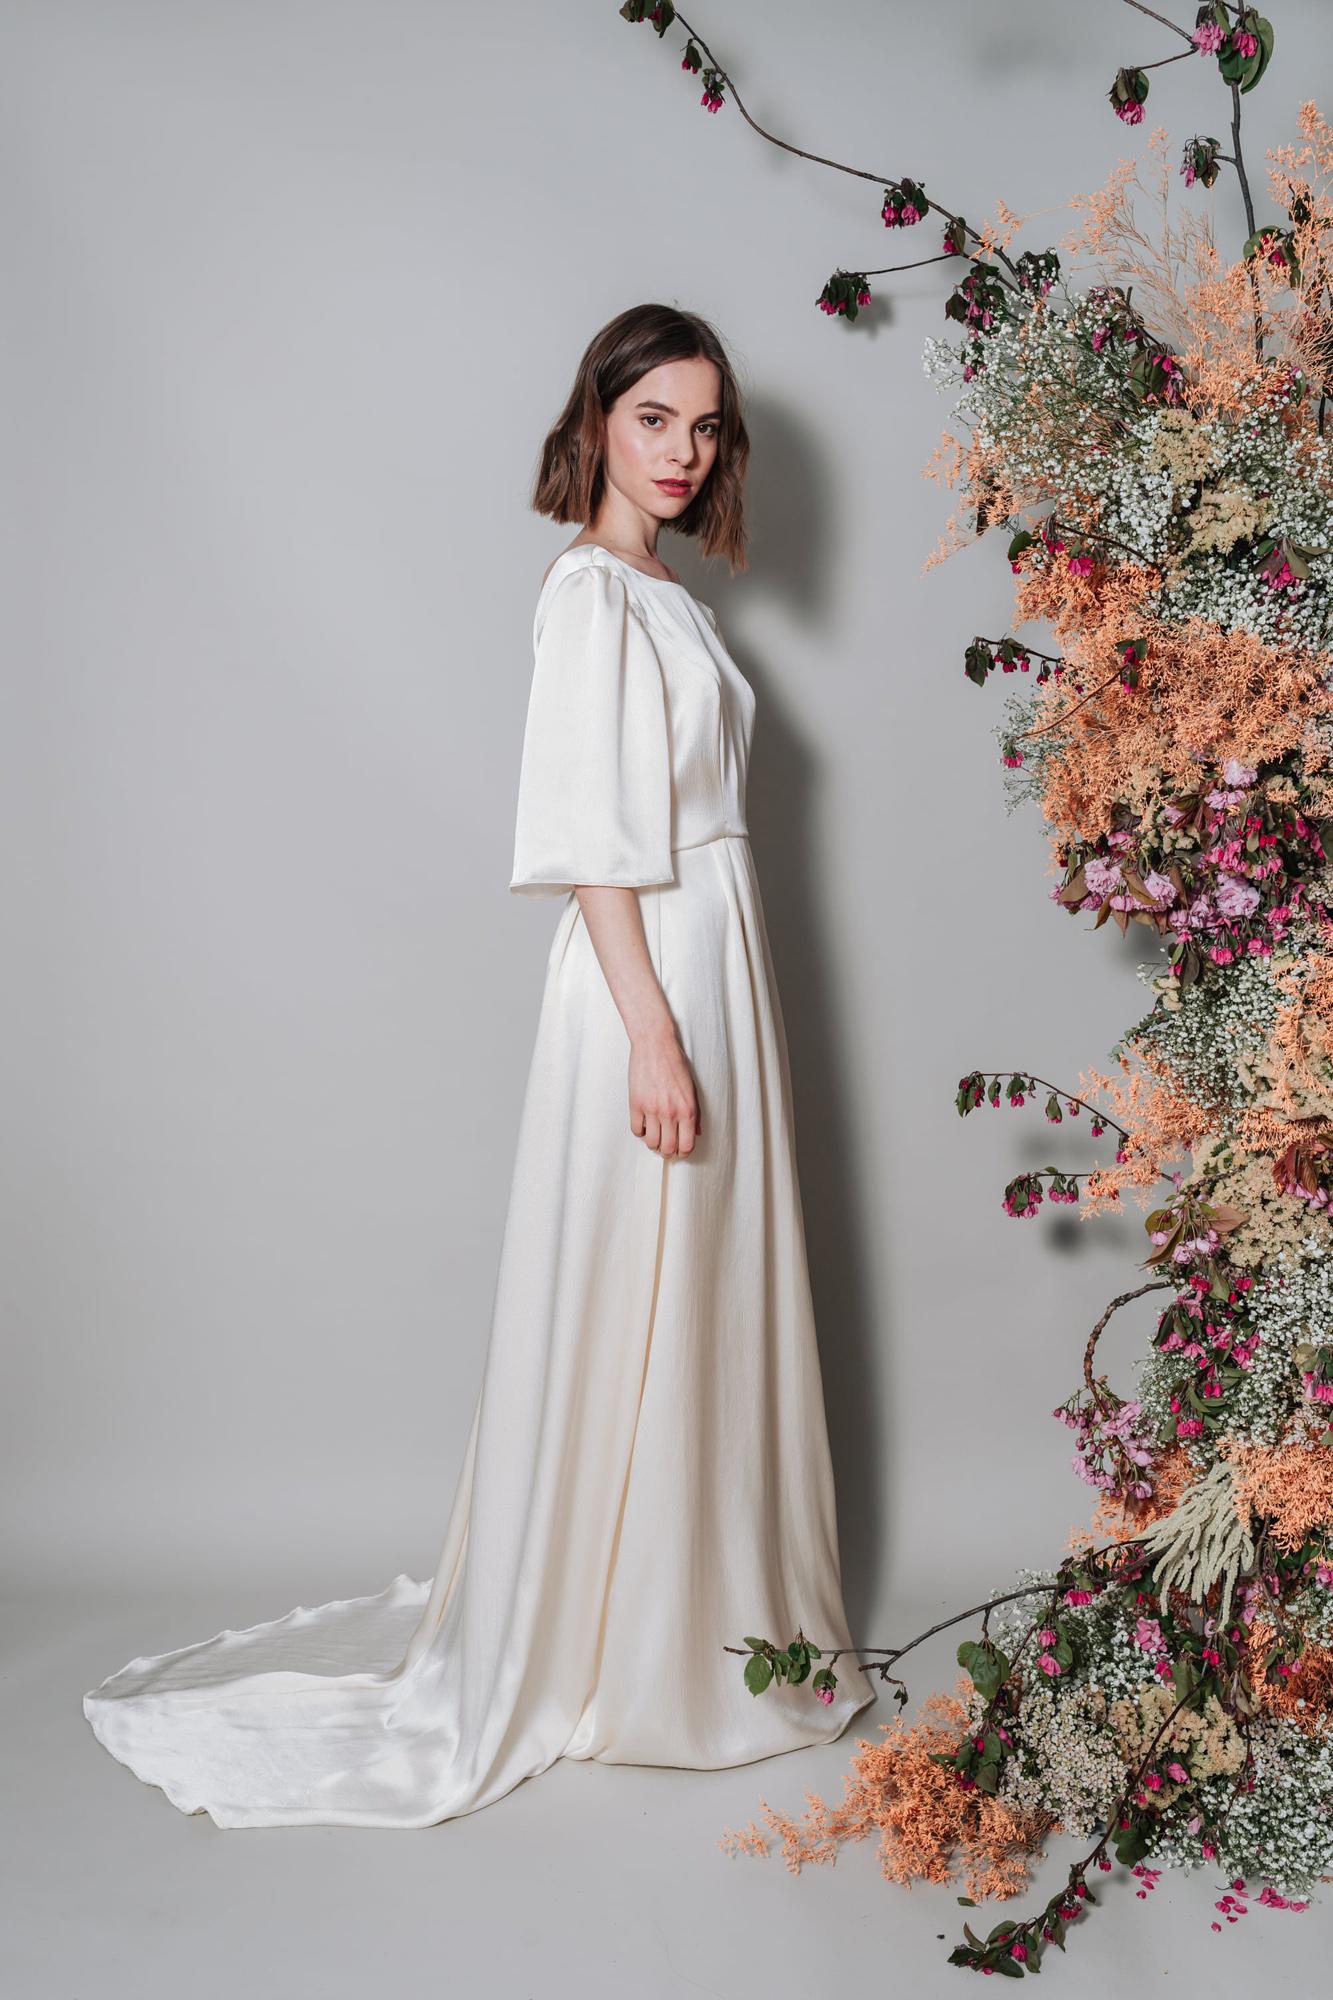 Kate-Beaumont-Lunaria-Bohemian-Hammered-Silk-Wedding-Dress-Sleeves-6.jpg